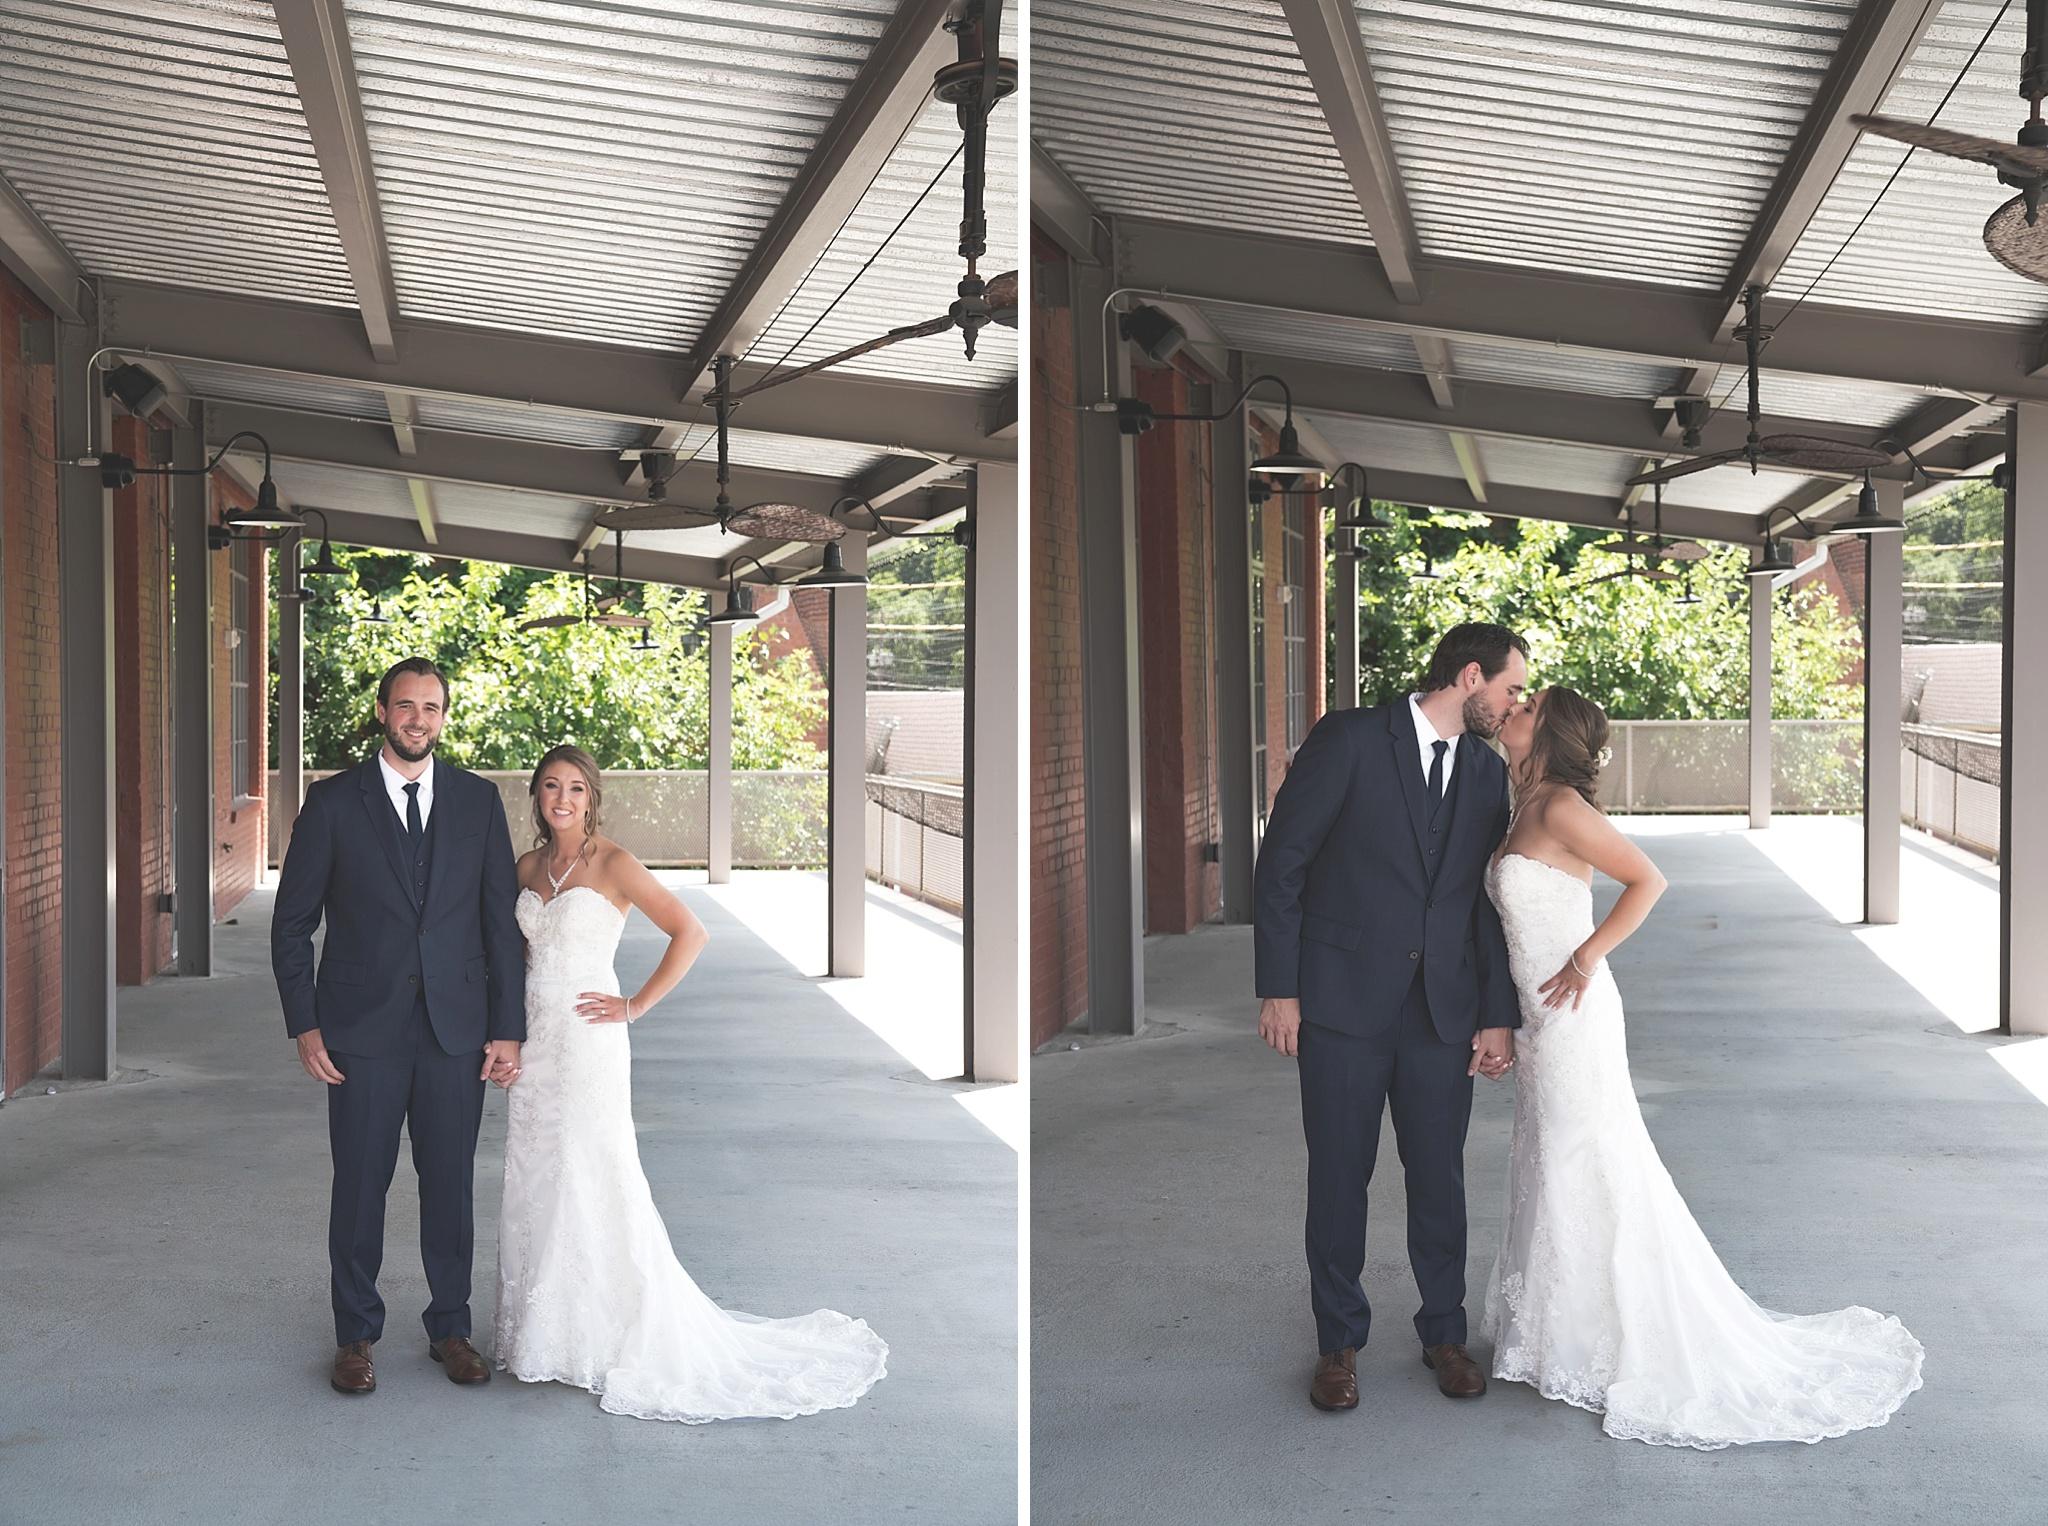 Rickhouse-Durham-NC-Wedding-Photographer-023.jpg